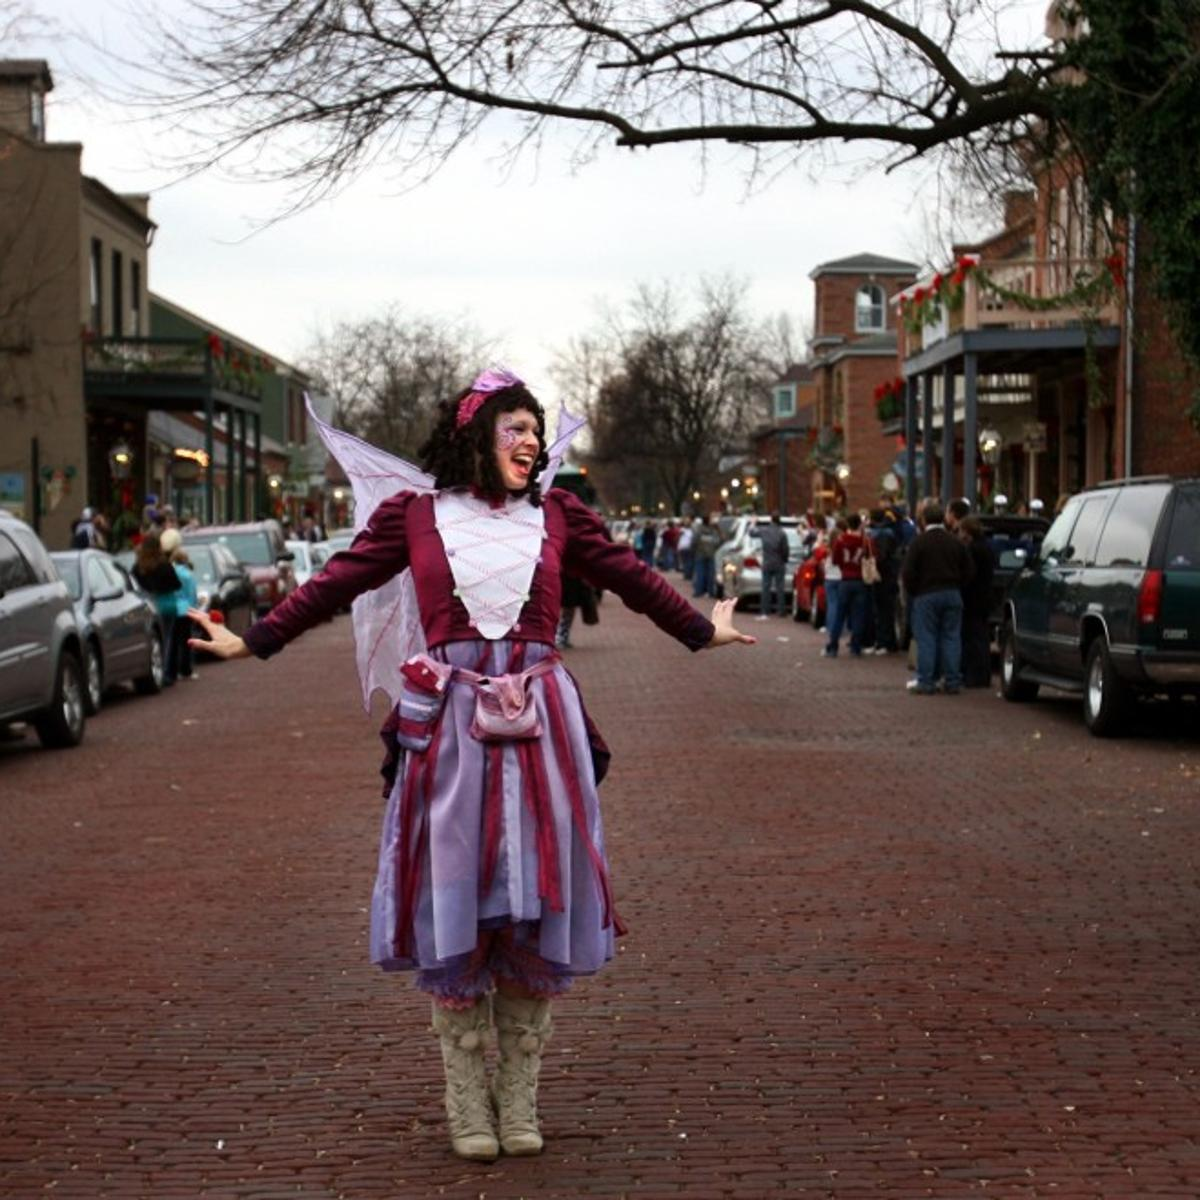 St Charles Christmas Parade 2020 McClellan: Keeping world safe from naughty fairies | Bill